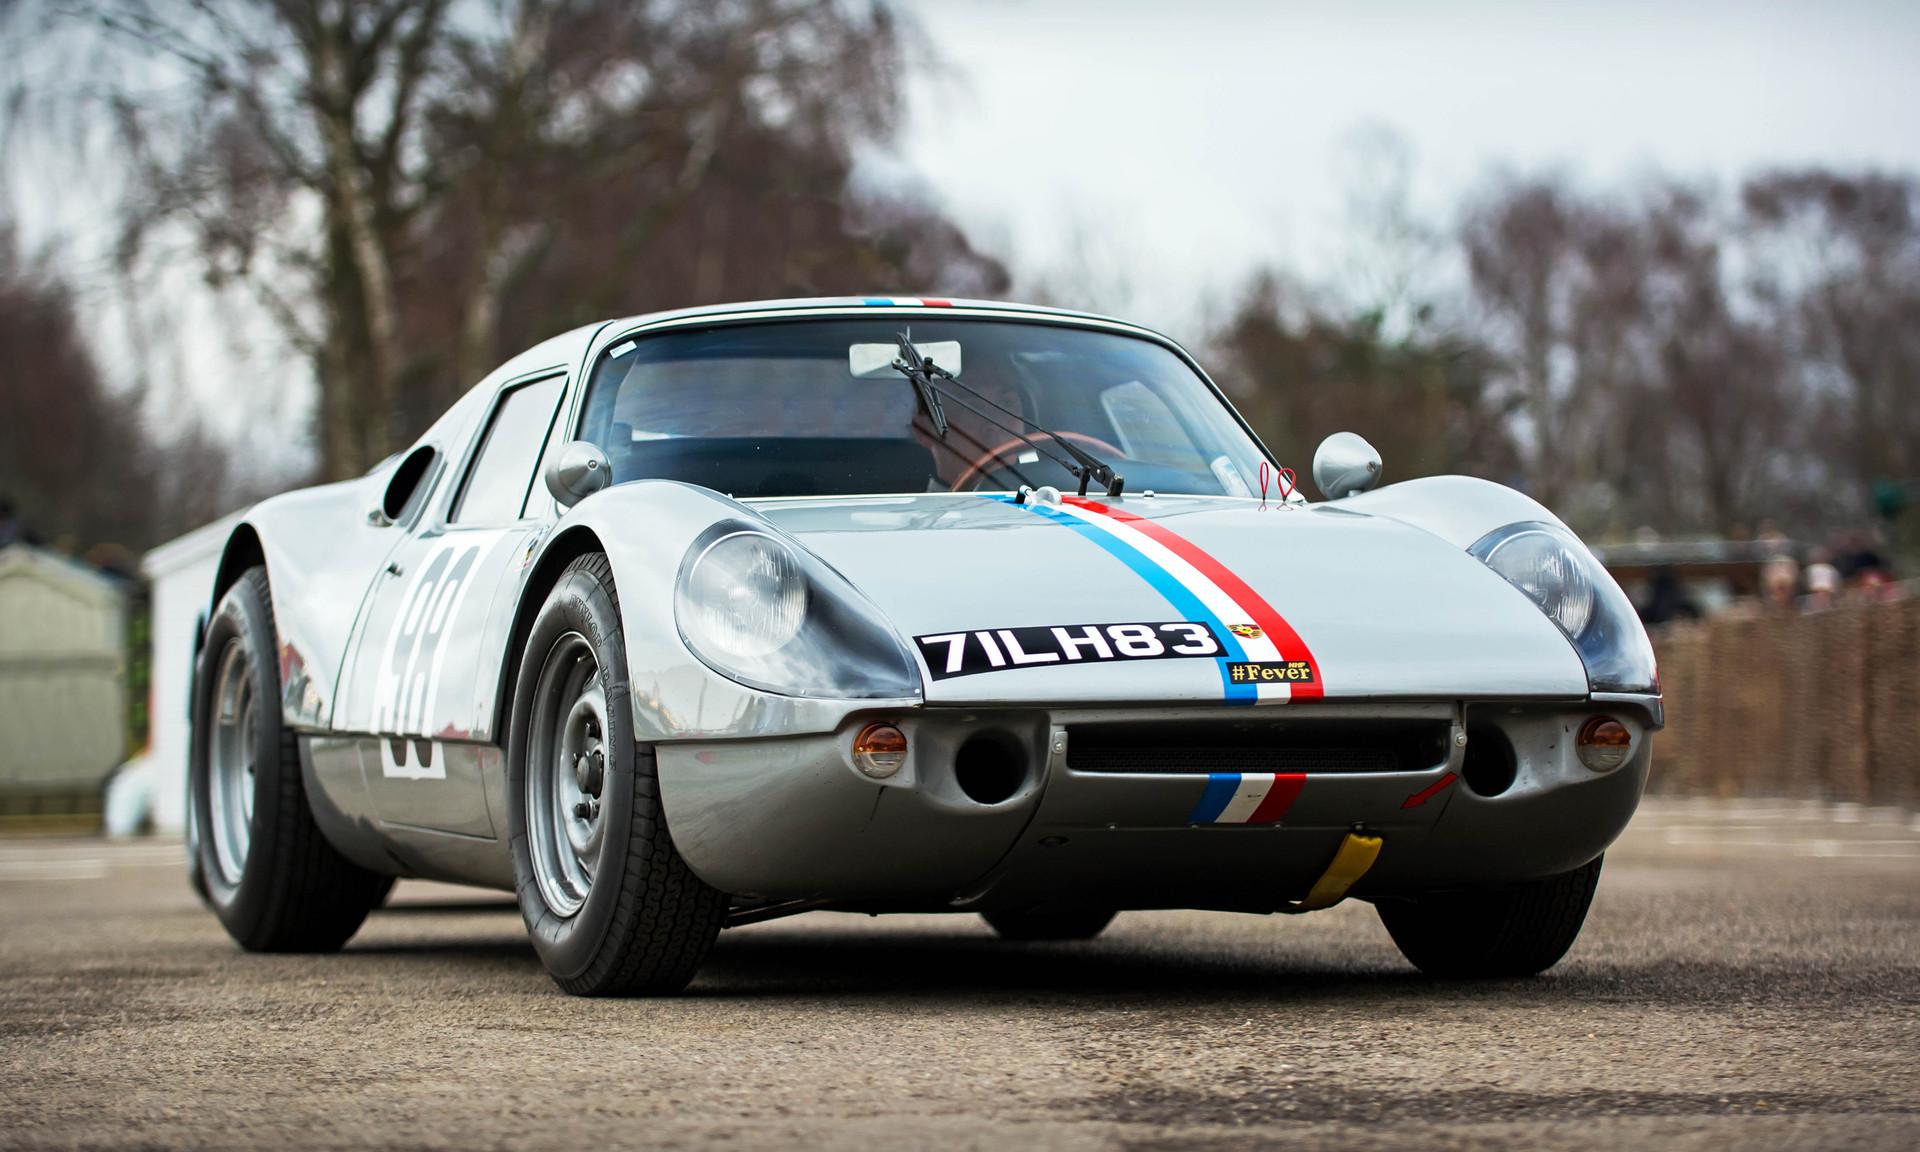 Phil Hylander & James Cottingham's 1964 Porsche 904 Carrera GTS at the Goodwood 76MM